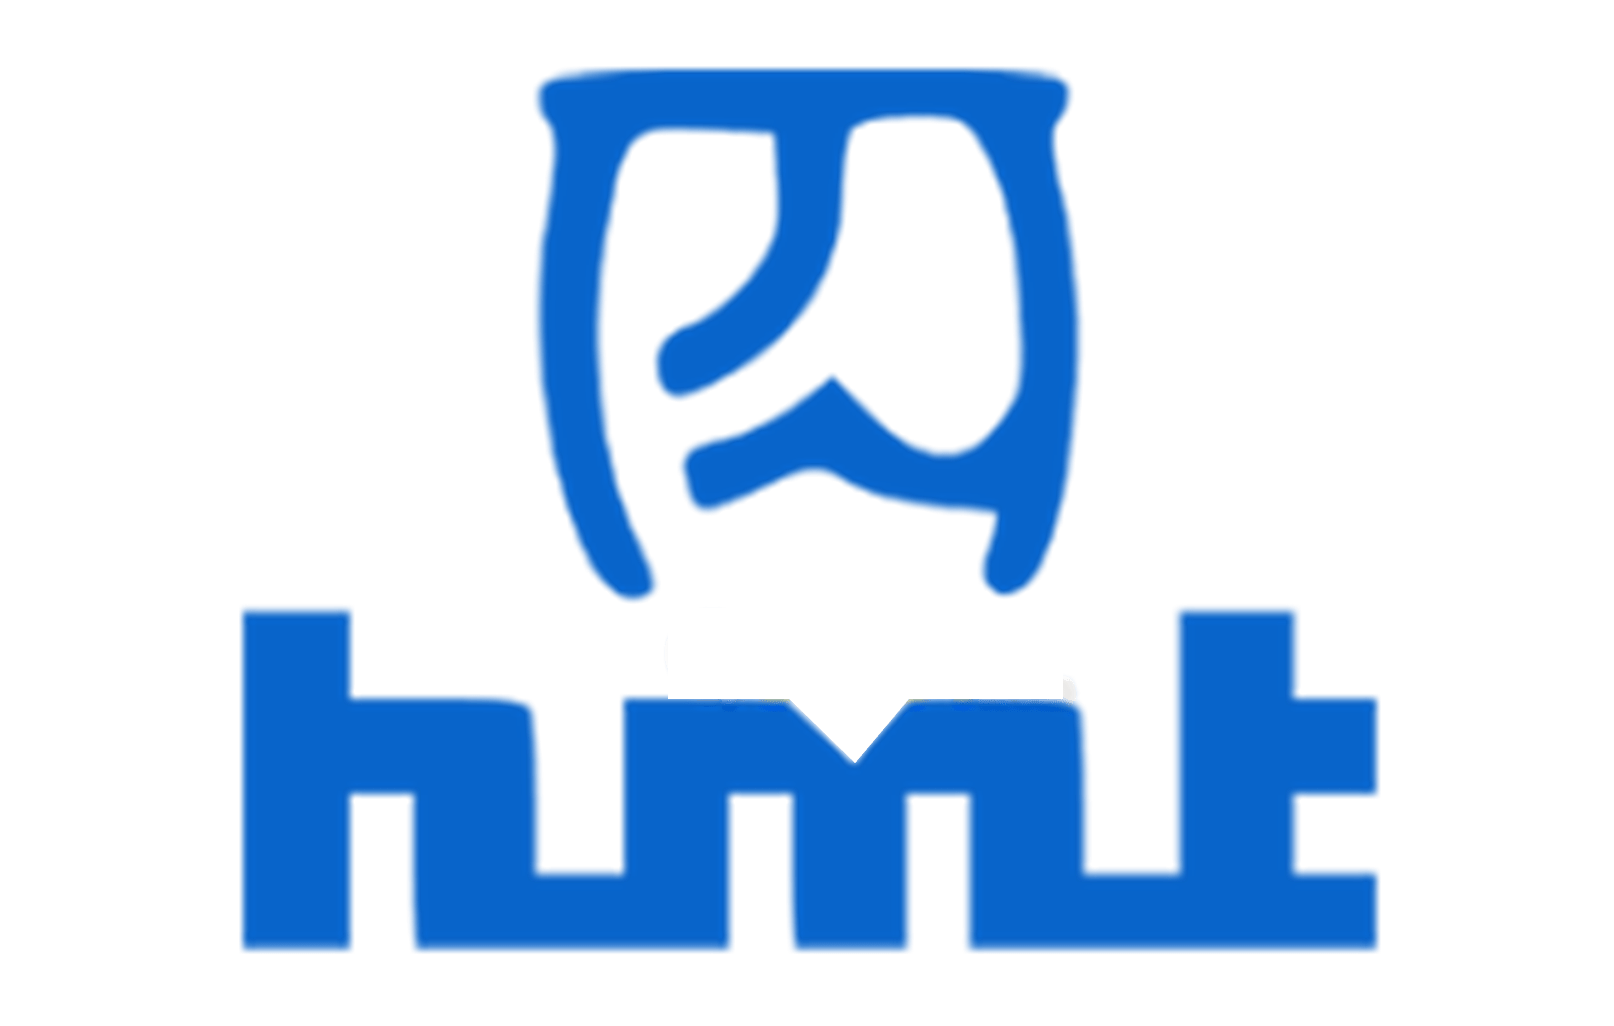 HMT LTD